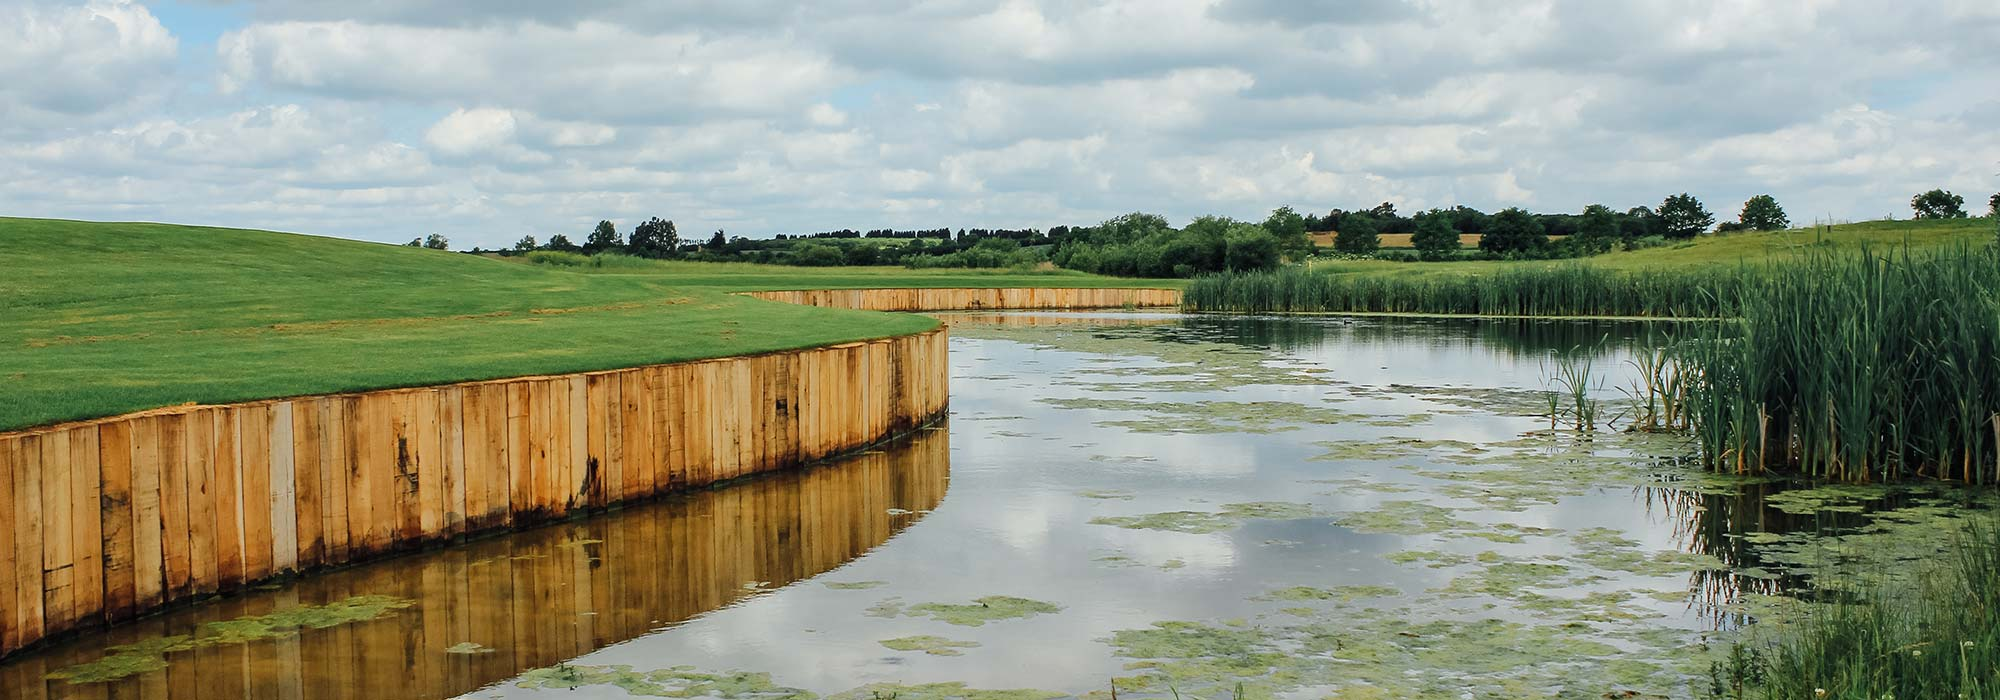 Golf Courses Photo